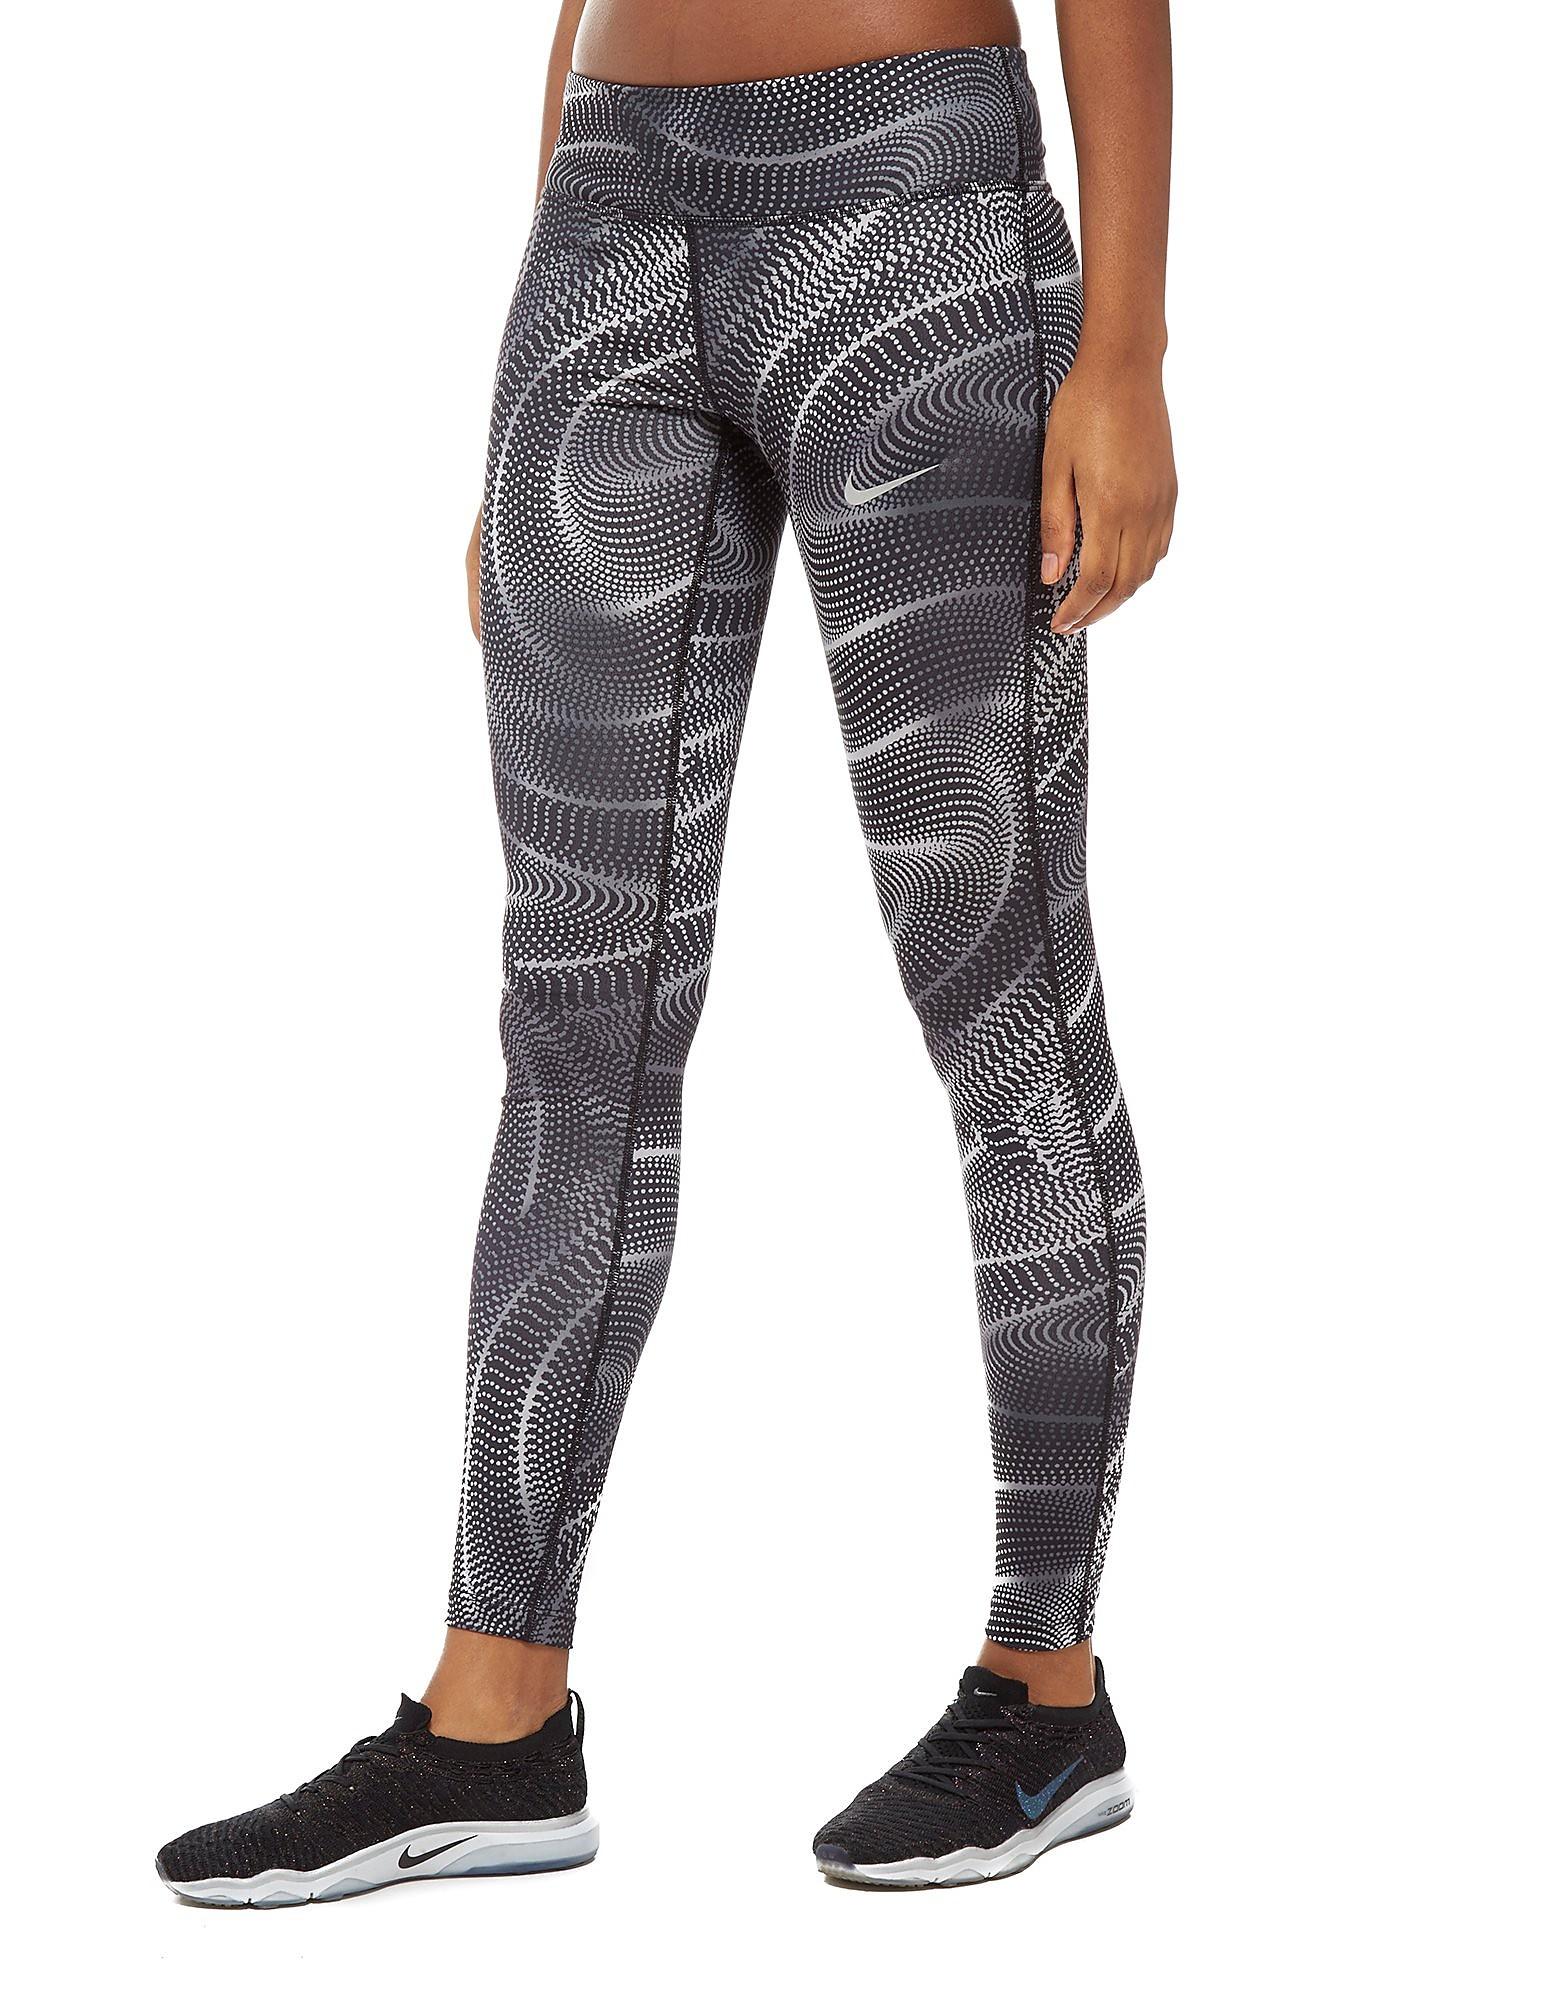 Nike Running Essential Printed Tights